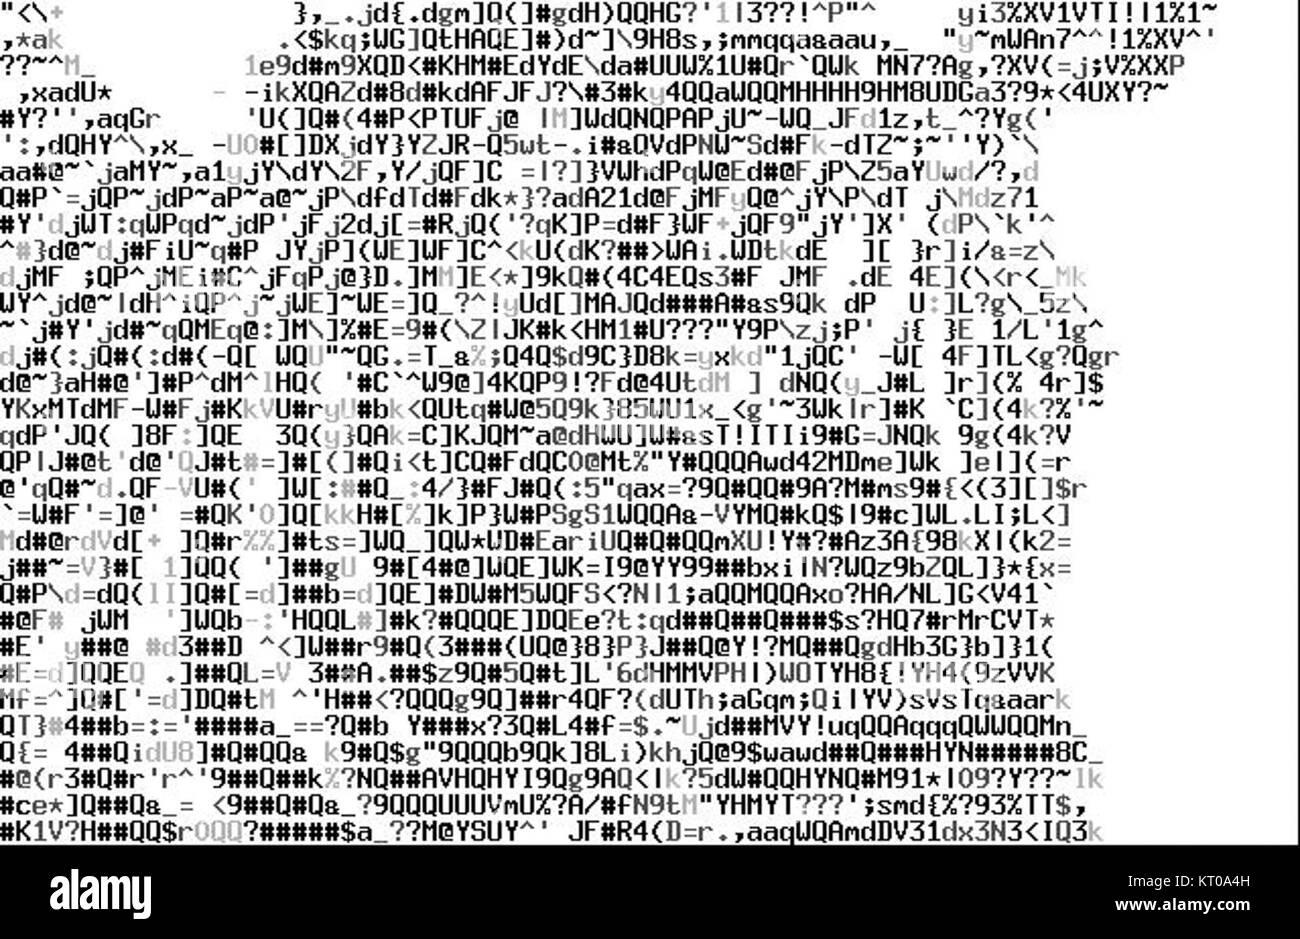 Converting images to ASCII art (Part 2) | Bites of code